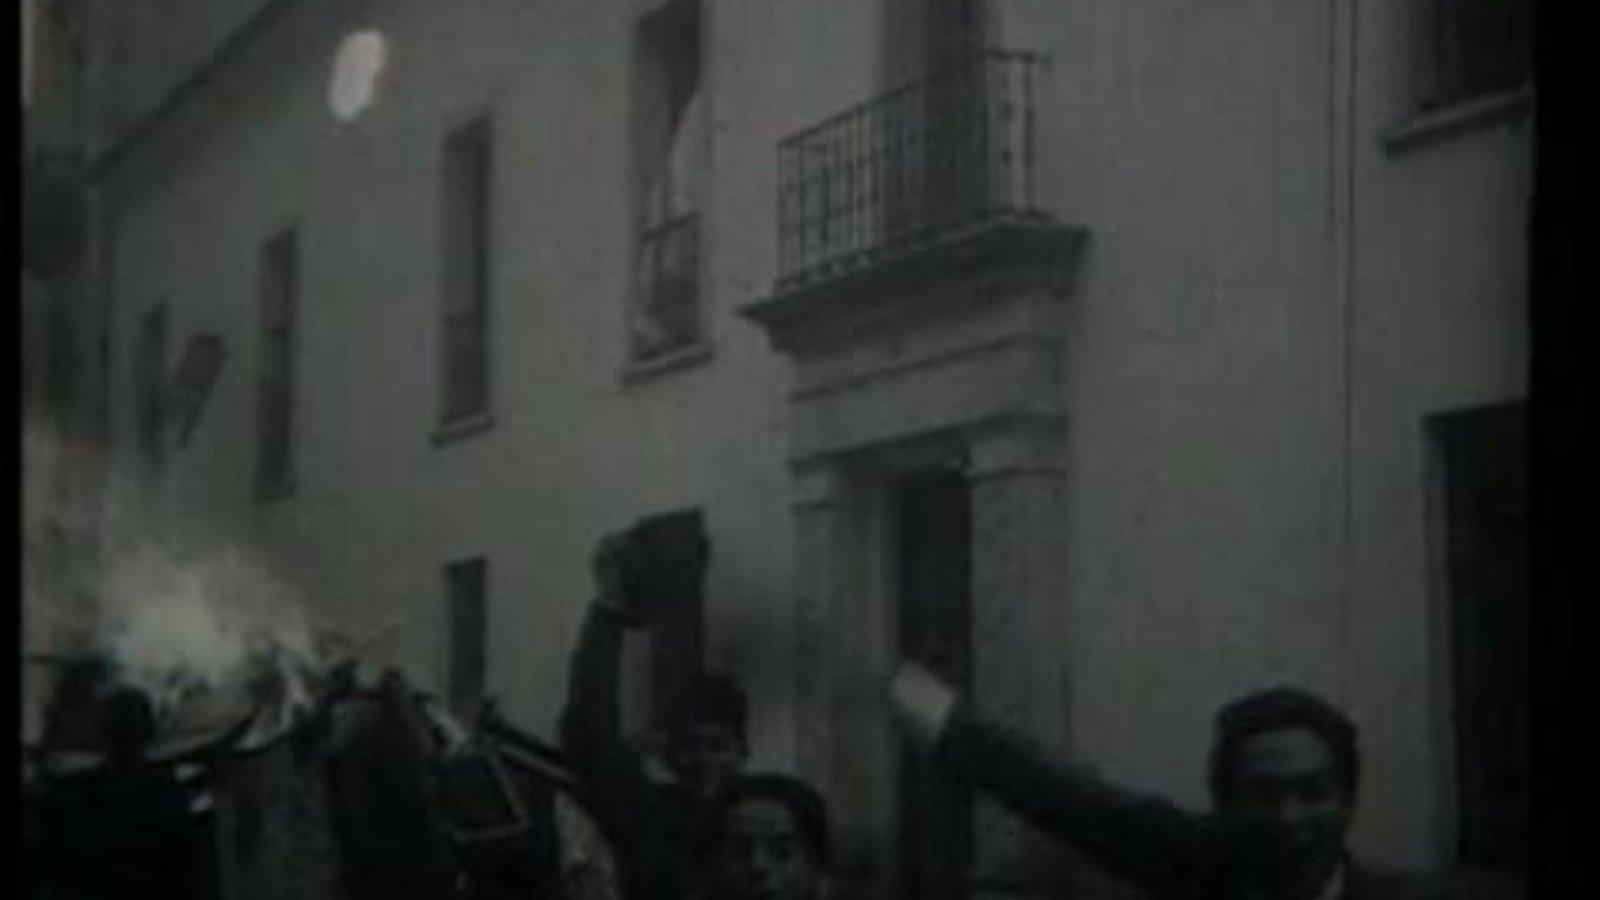 Jorge Gaitan - The End Of A Colombian Dream